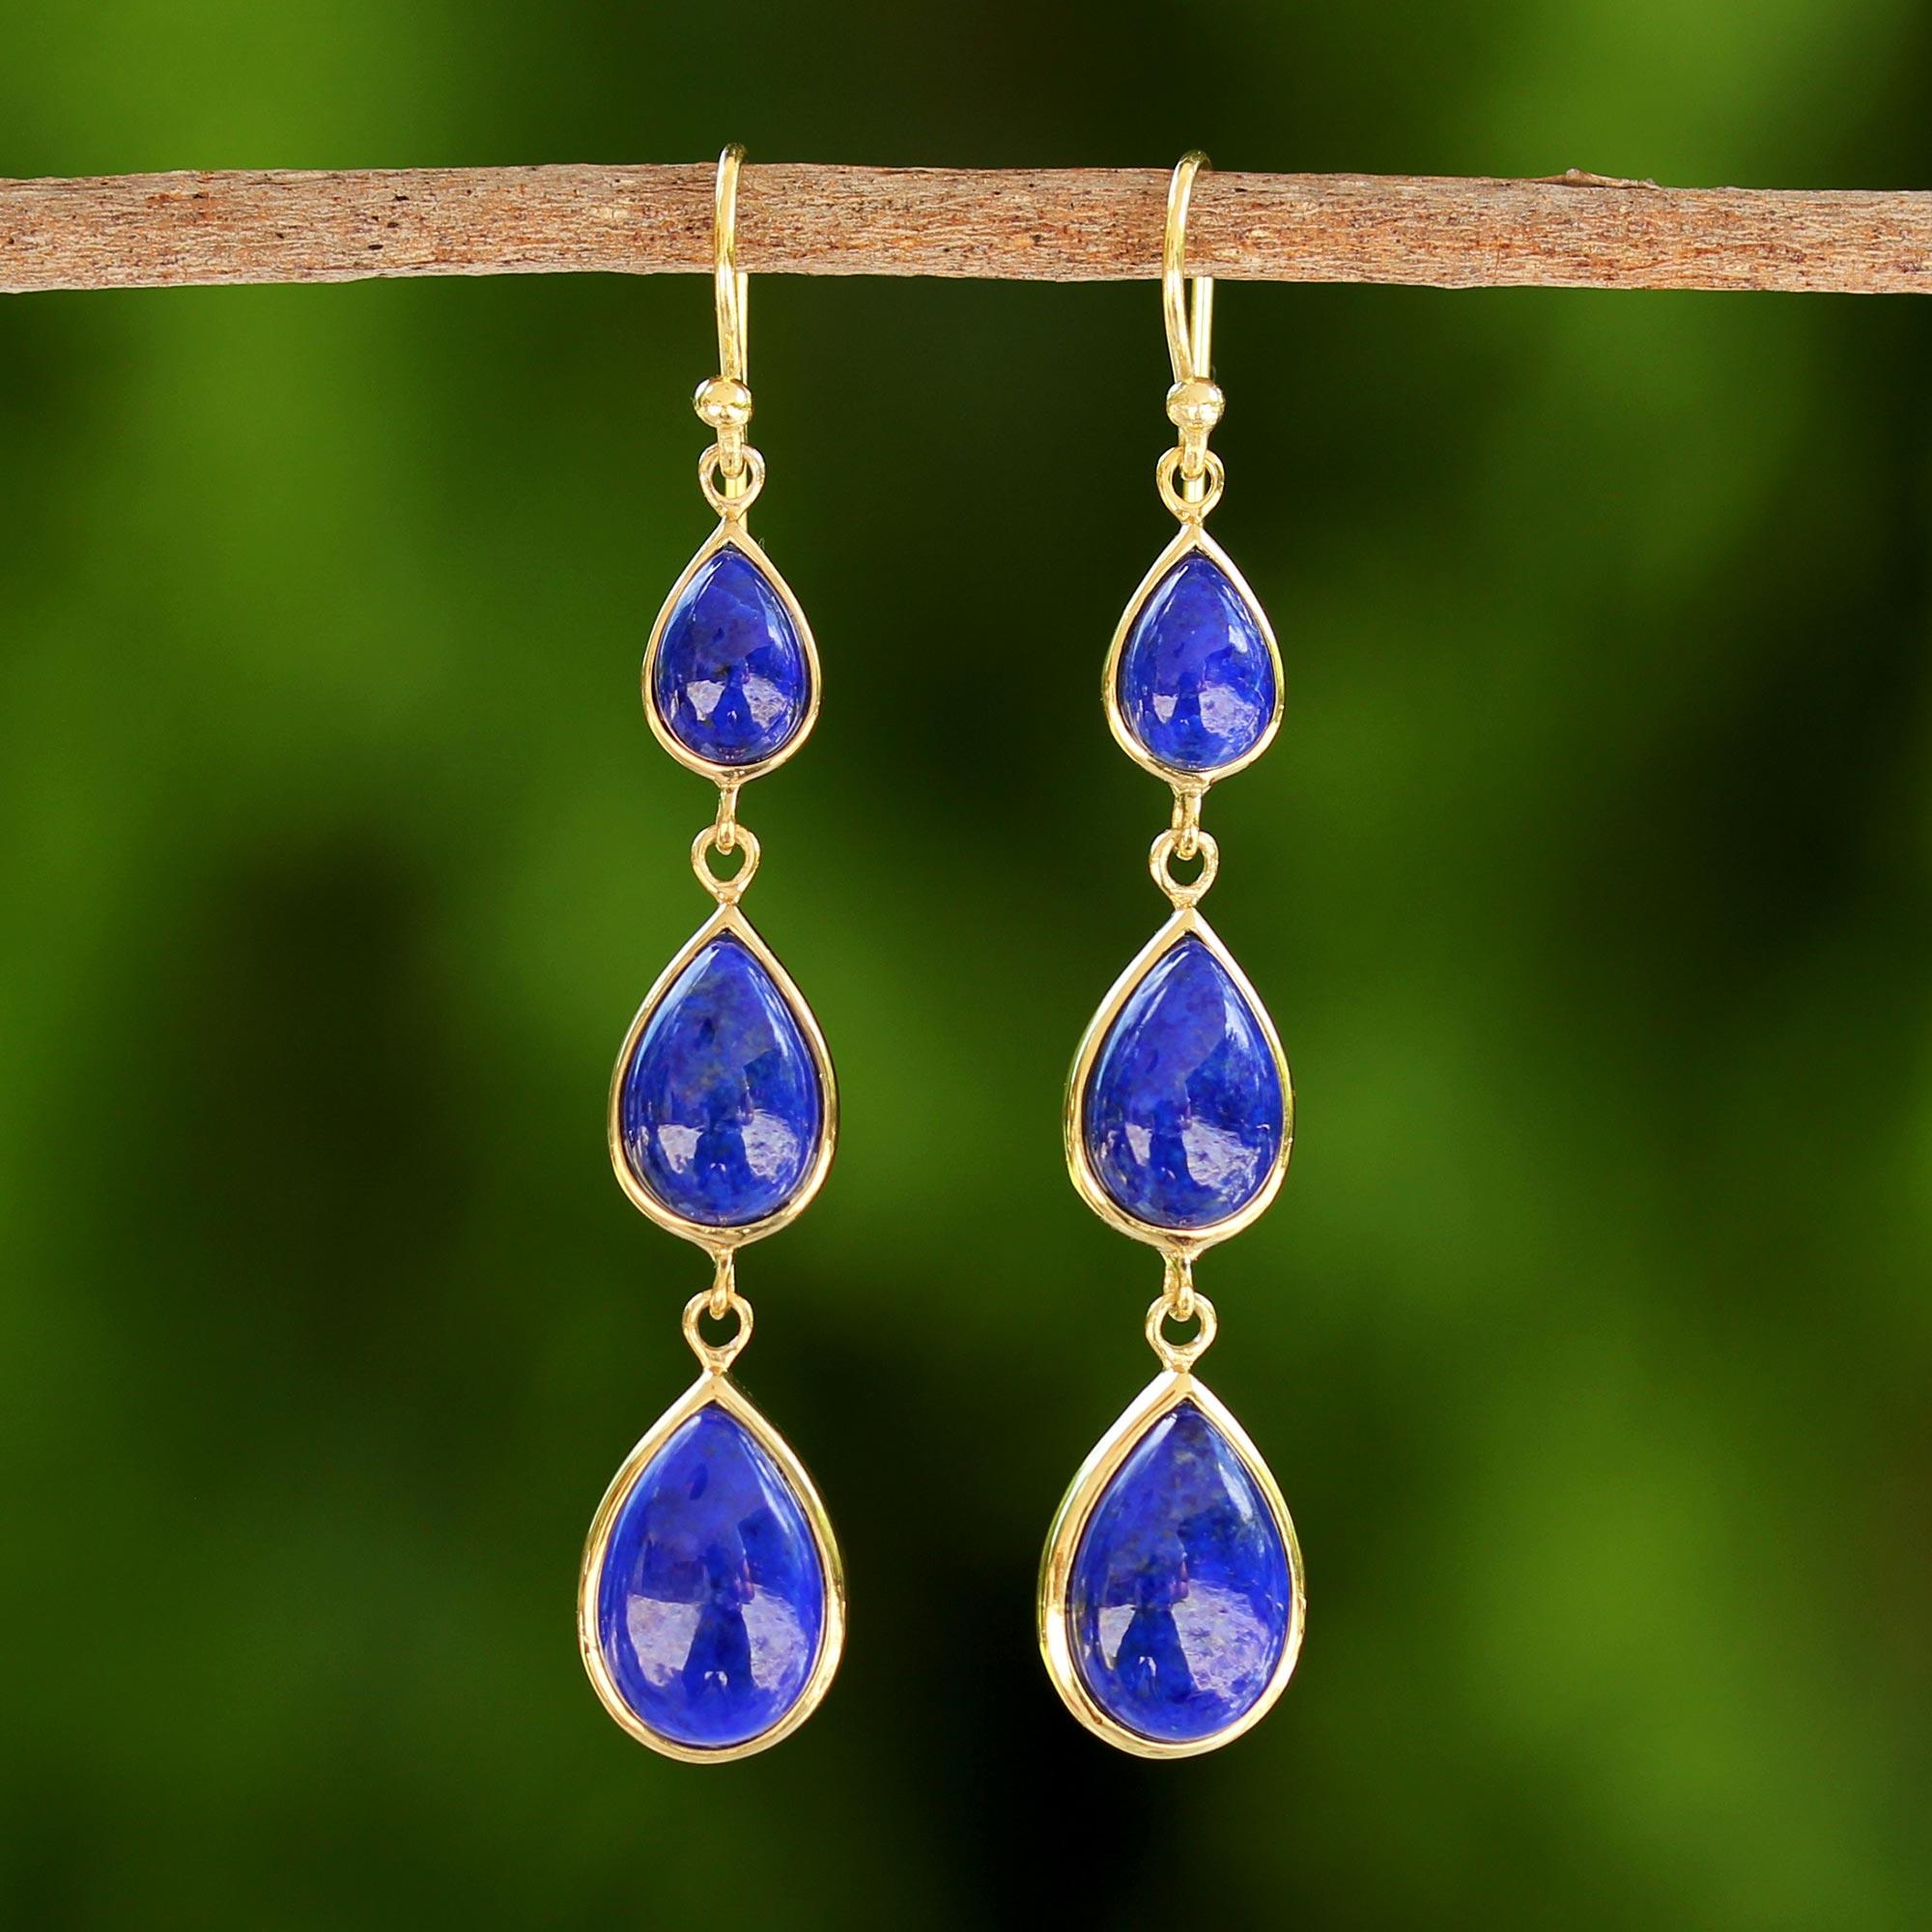 18k Gold Plated Handmade 925 Silver Lapis Gemstone Hook Earrings Jewelry